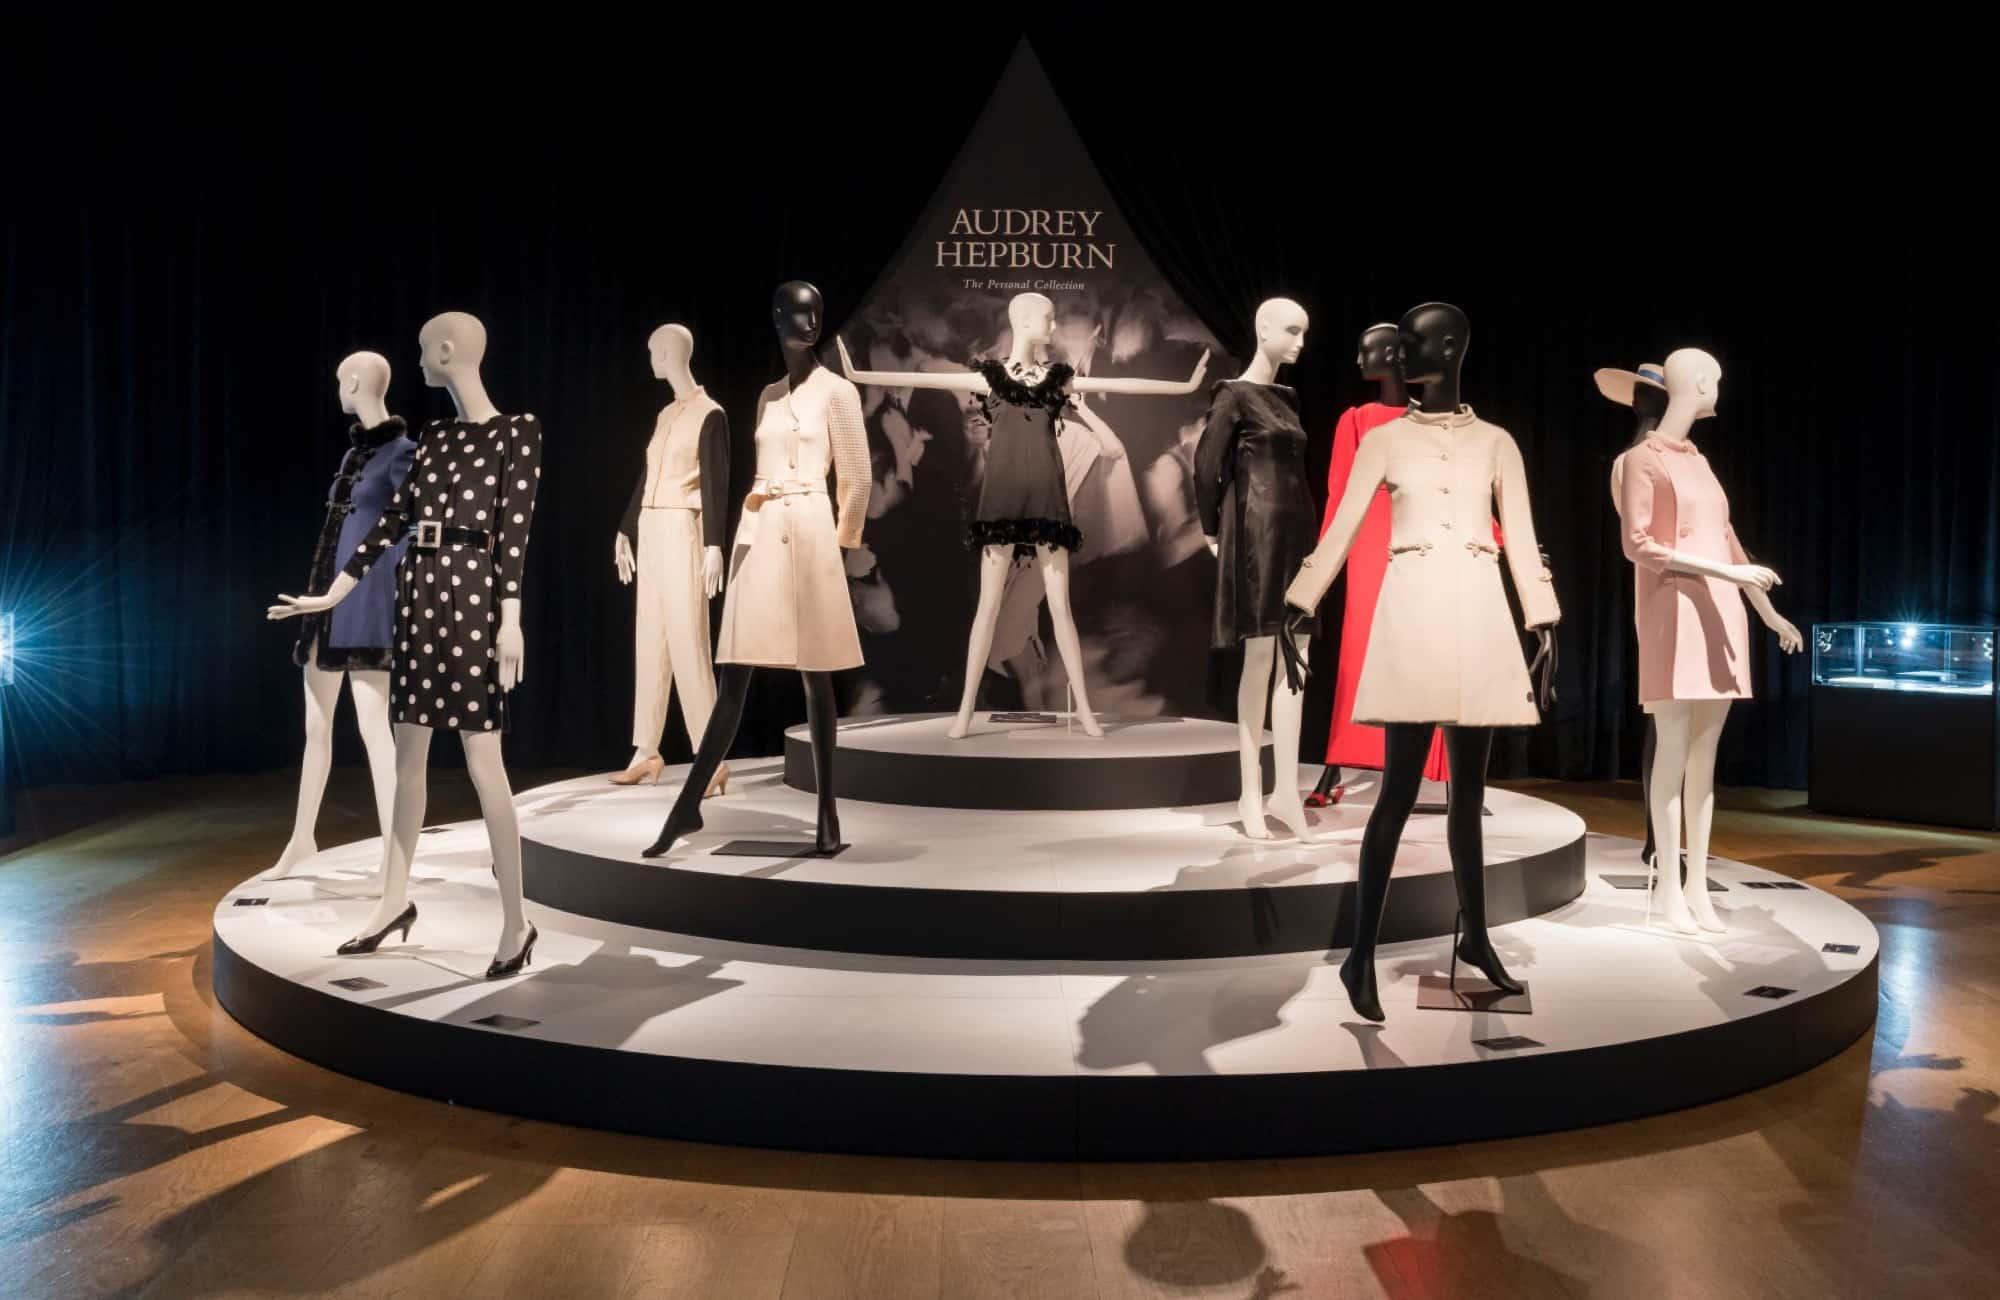 Schläppi 2200 Mannequins for Christie's Audrey Hepburn event